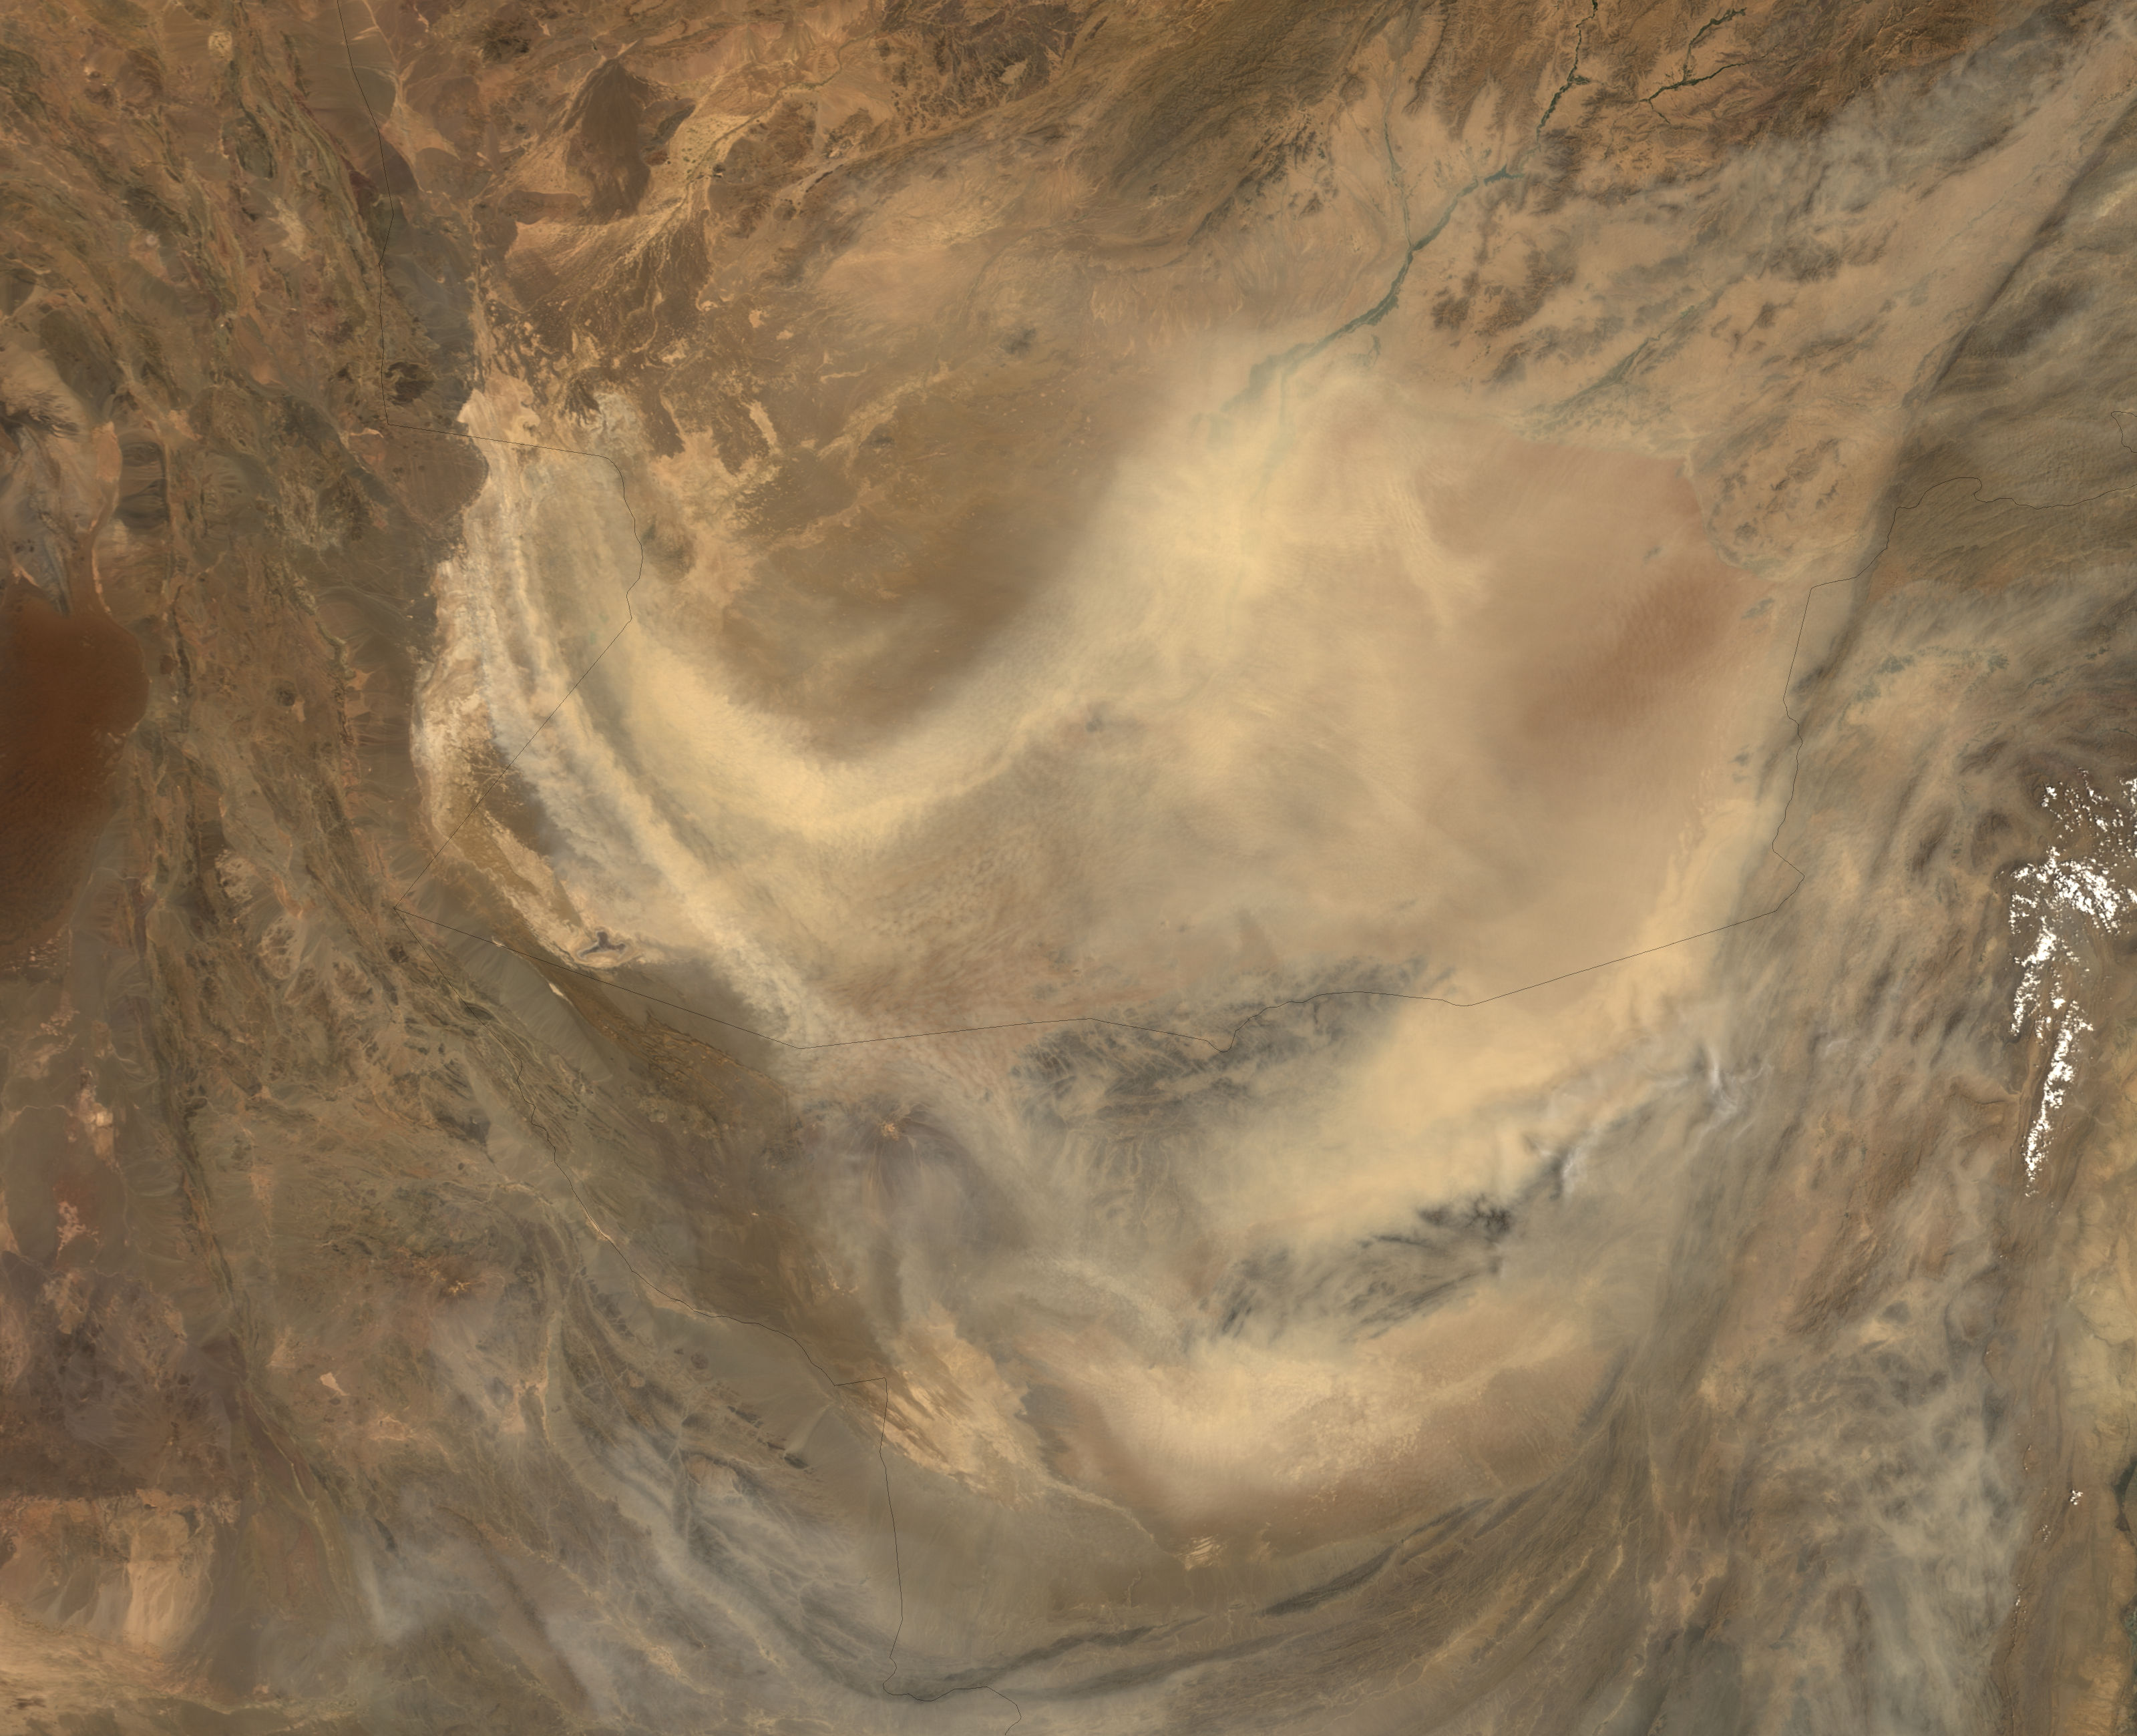 Dust storm in Afghanistan